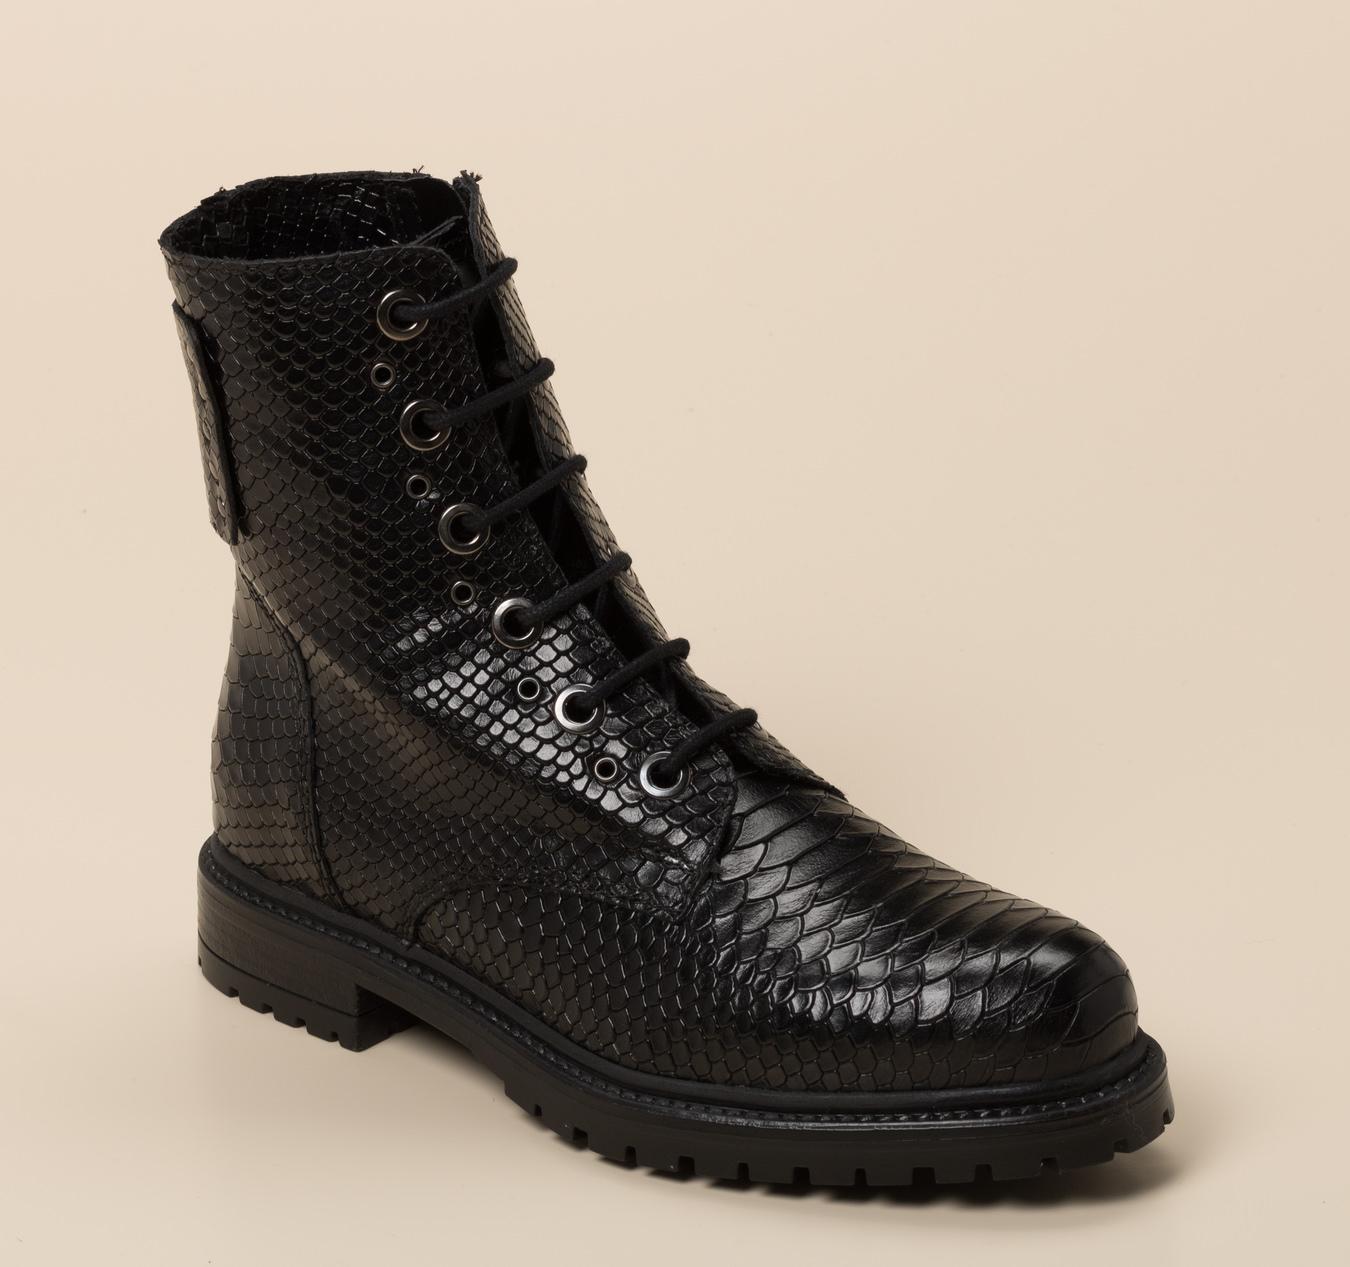 Hochwertige Schuhe Damen Andrea Sabatini Stiefelette